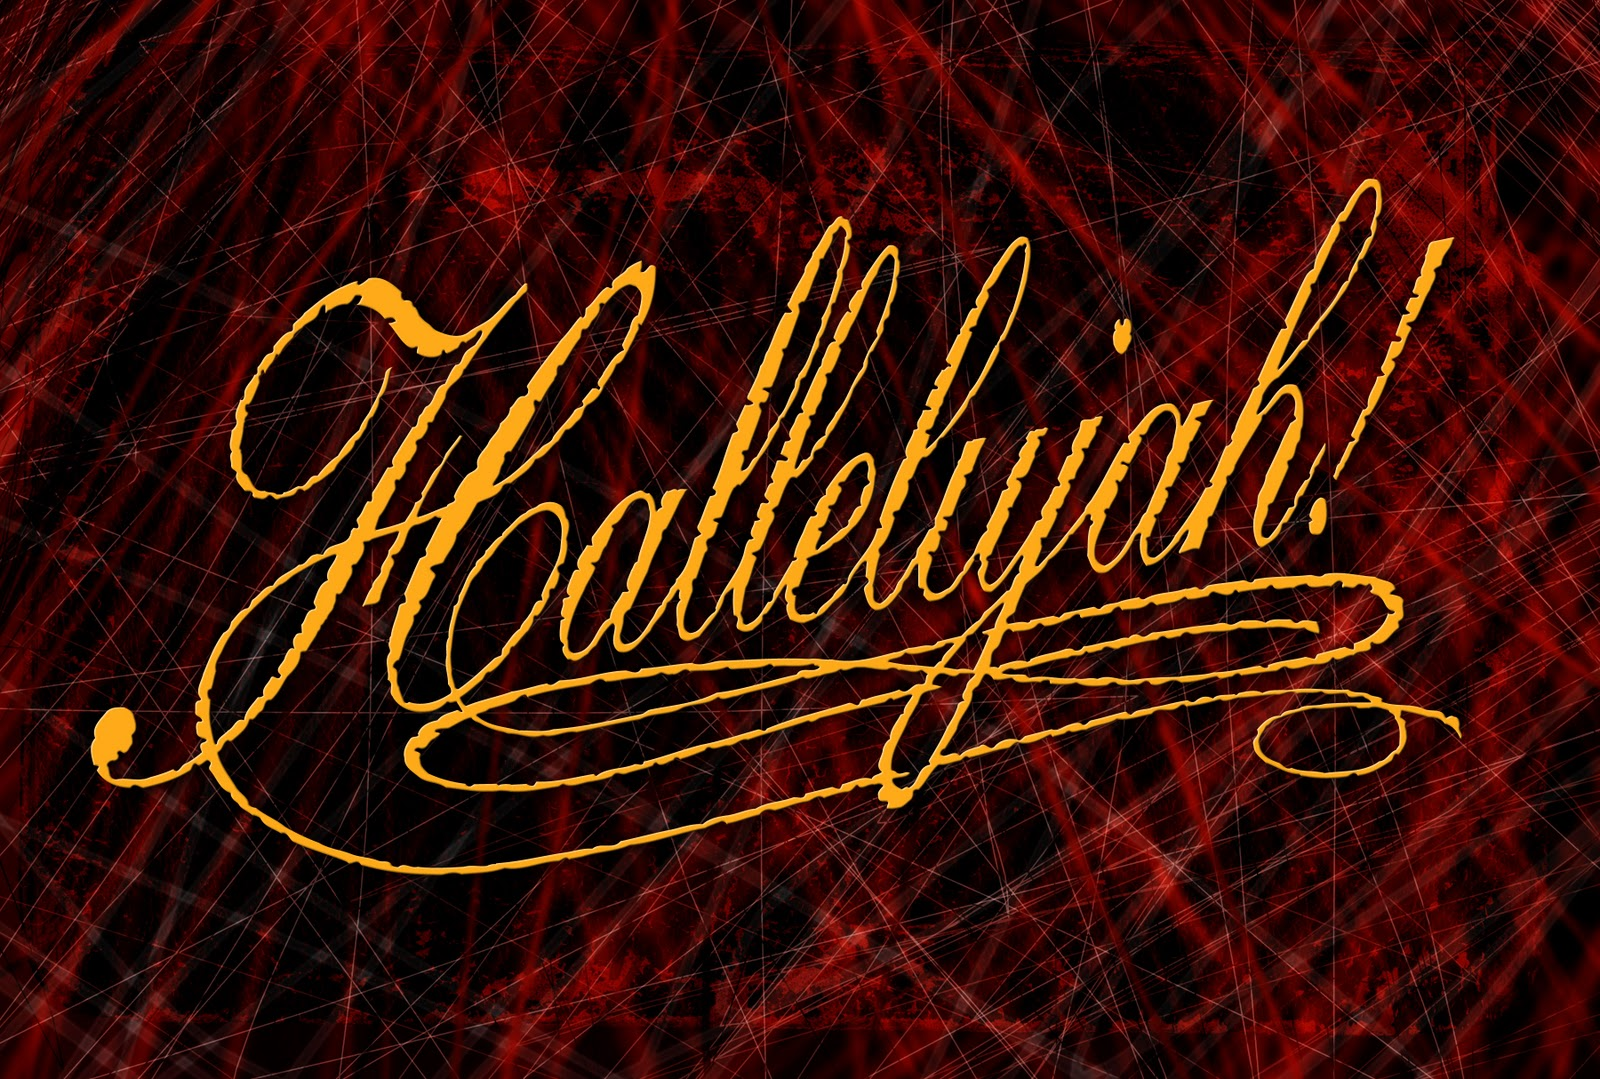 Hallelujah You're Worthy To Be Praised!